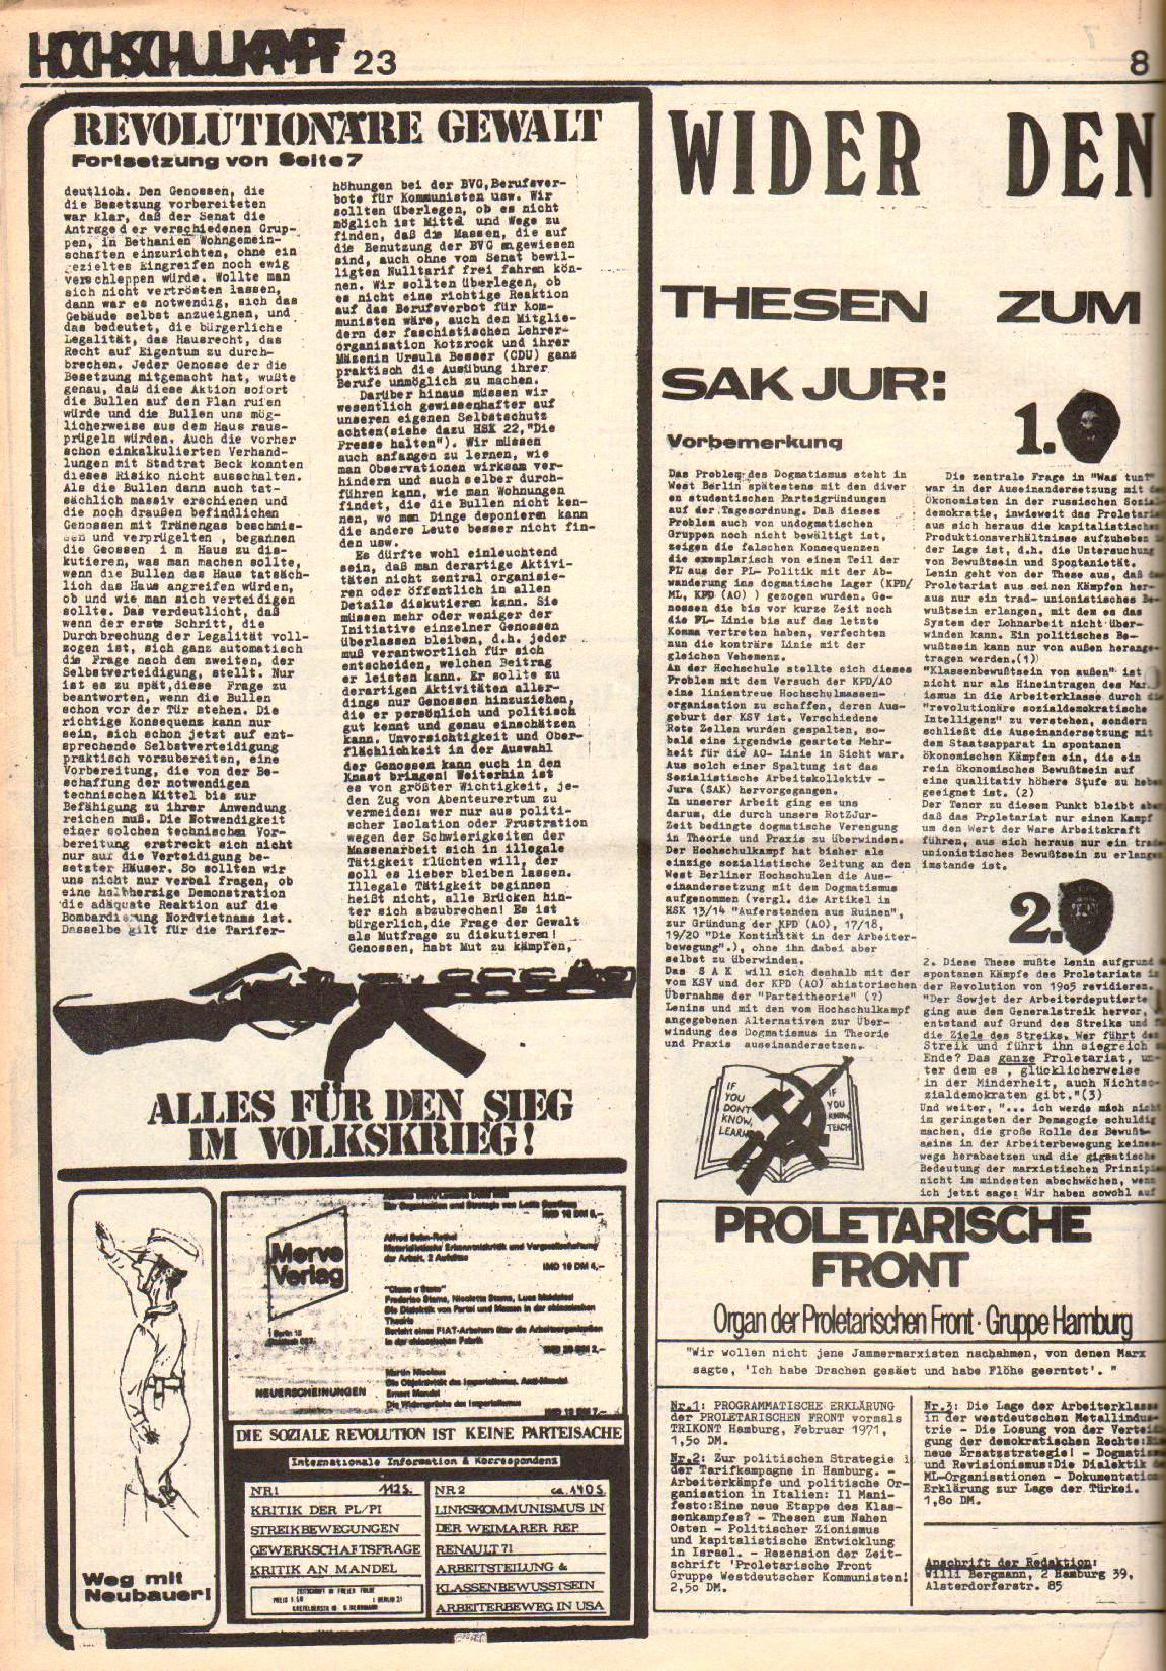 Berlin_Hochschulkampf_1971_23_08